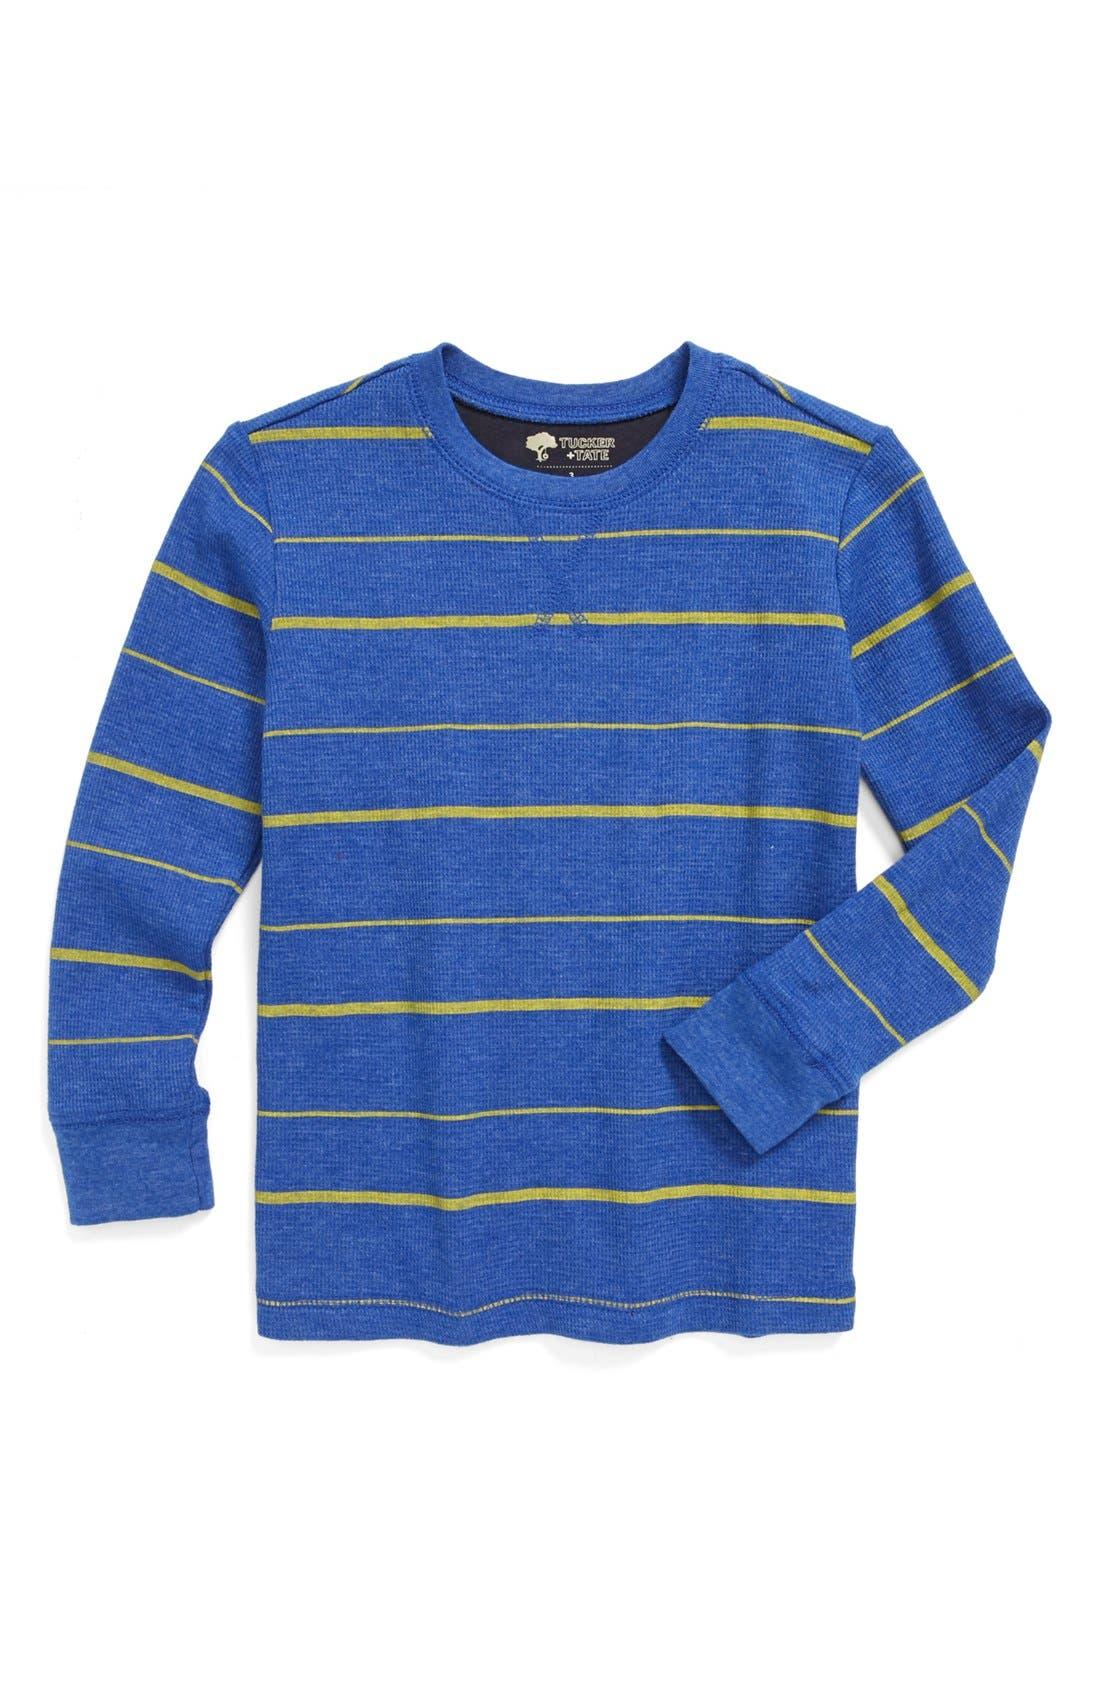 Alternate Image 1 Selected - Tucker + Tate 'Sultan' Print Long Sleeve T-Shirt (Toddler Boys)